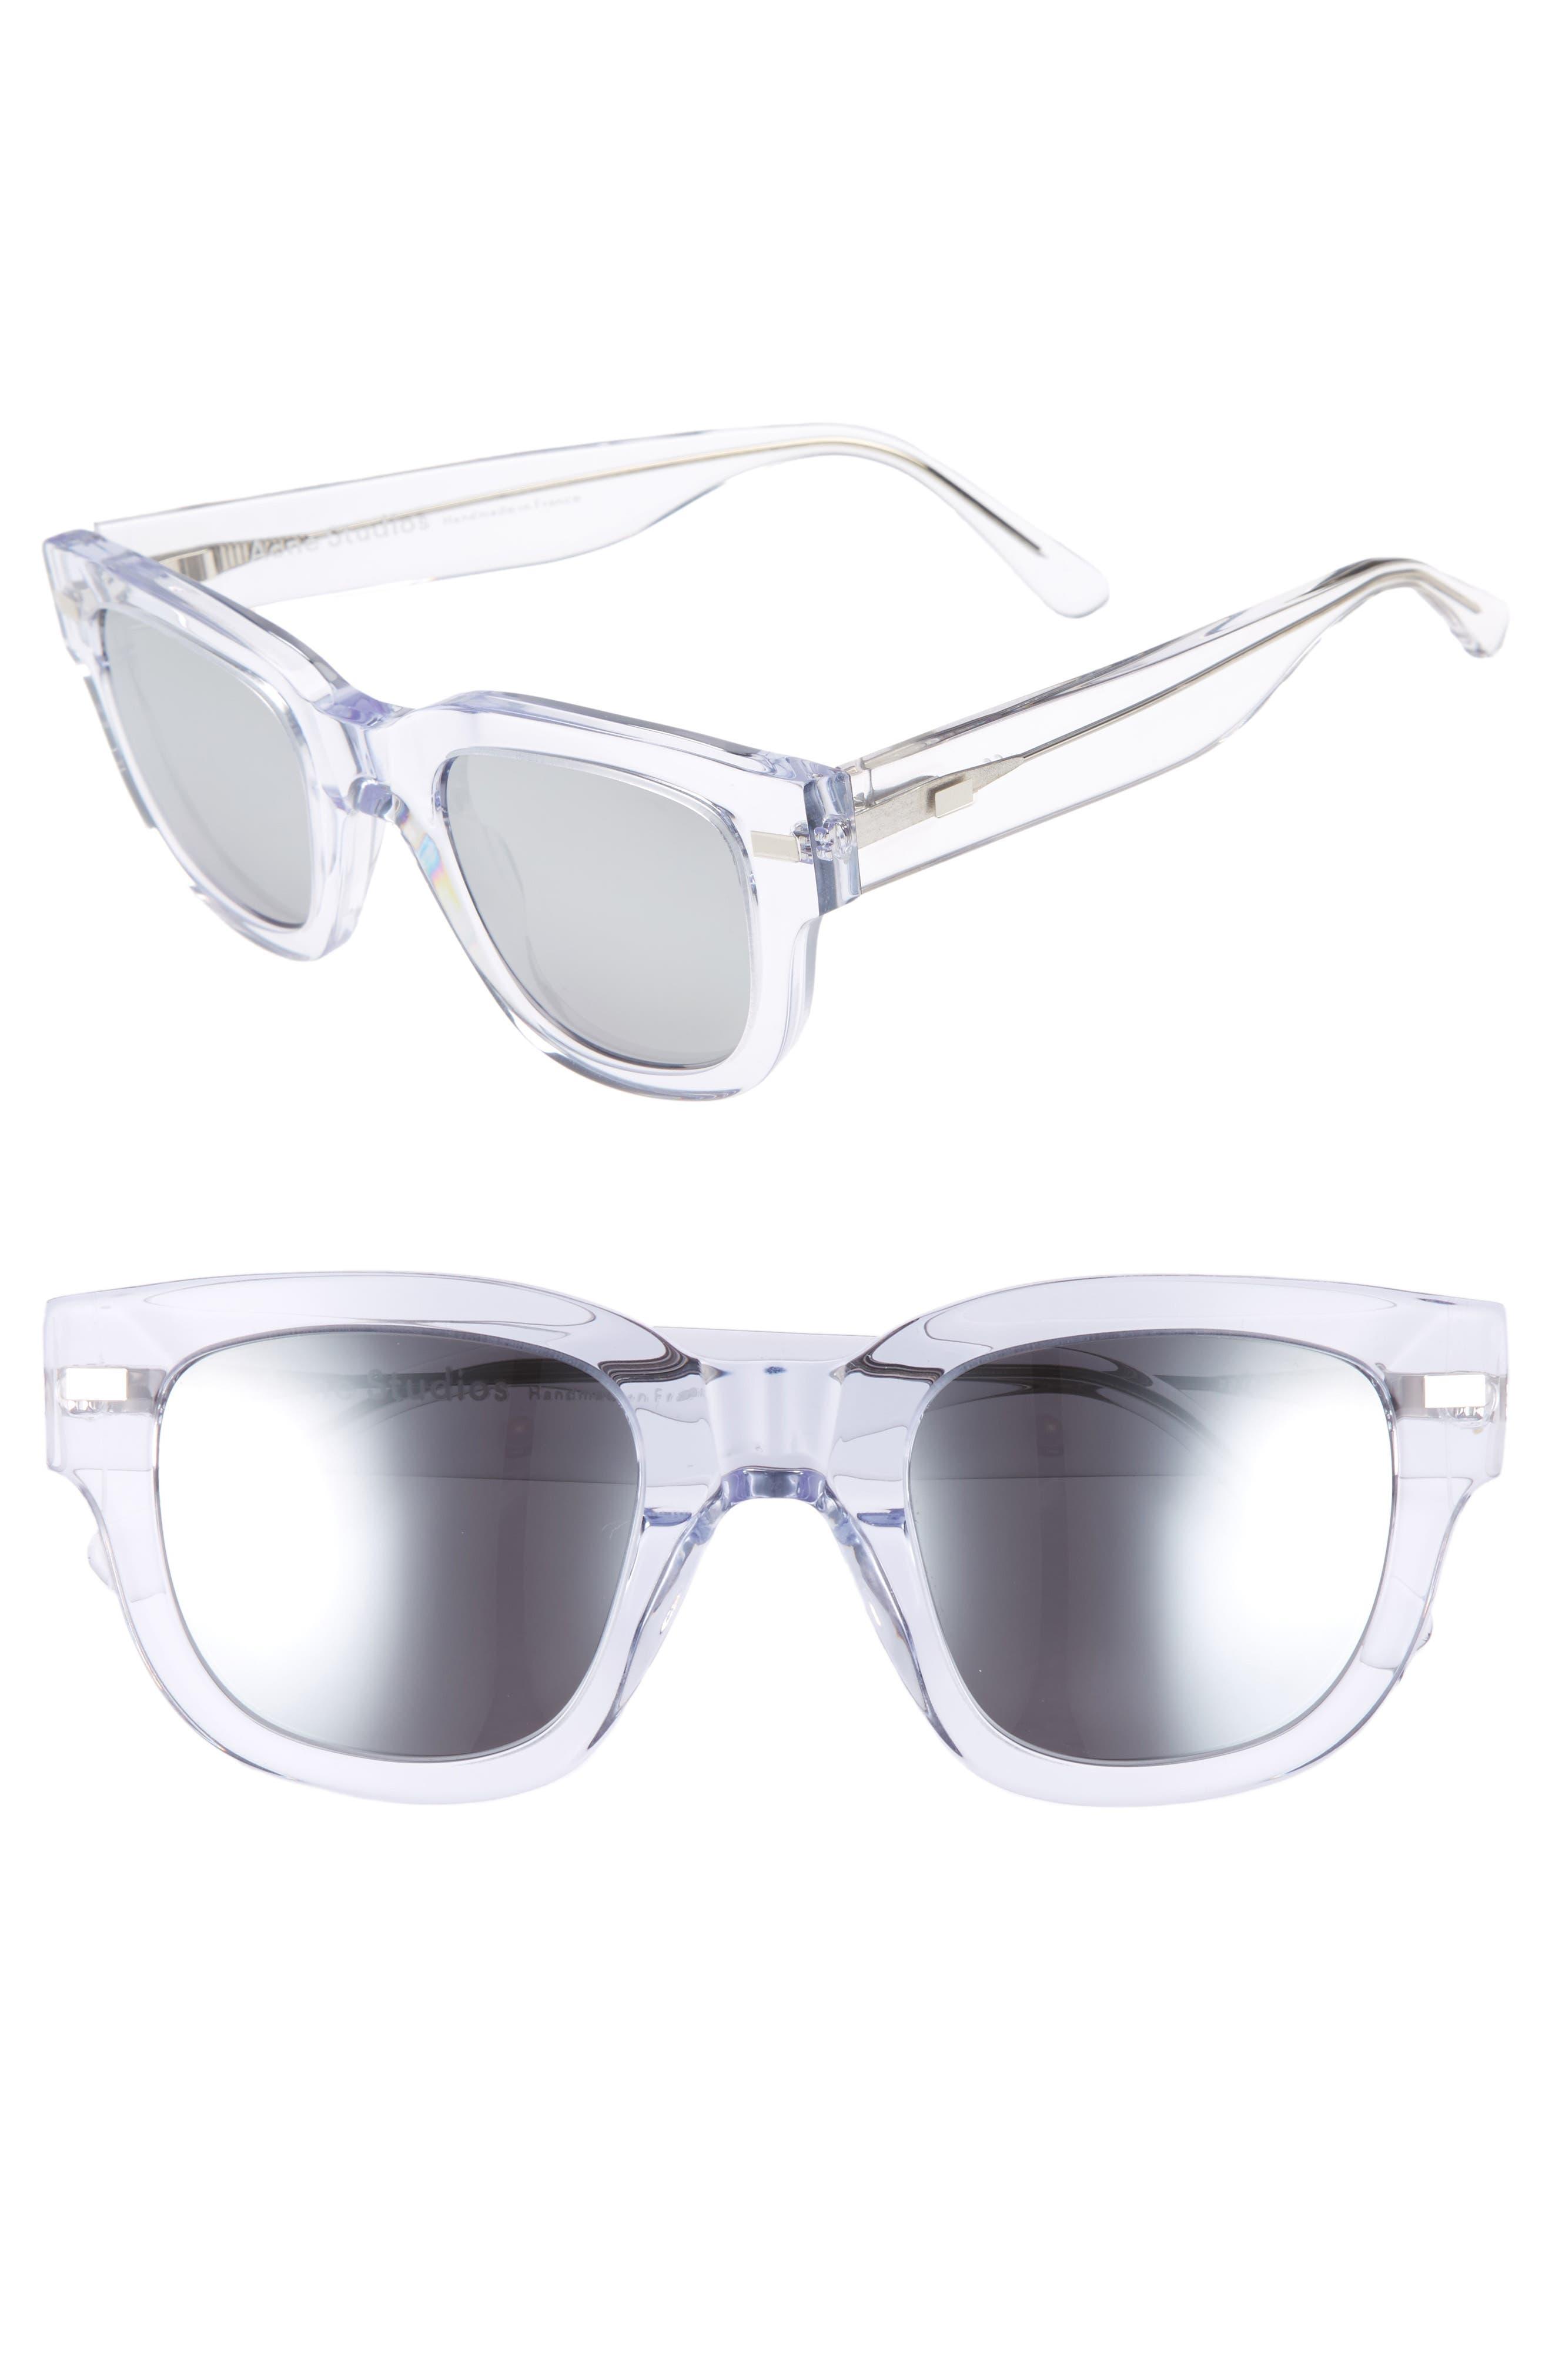 47mm Sunglasses,                         Main,                         color, Clear/ Silver Mirror